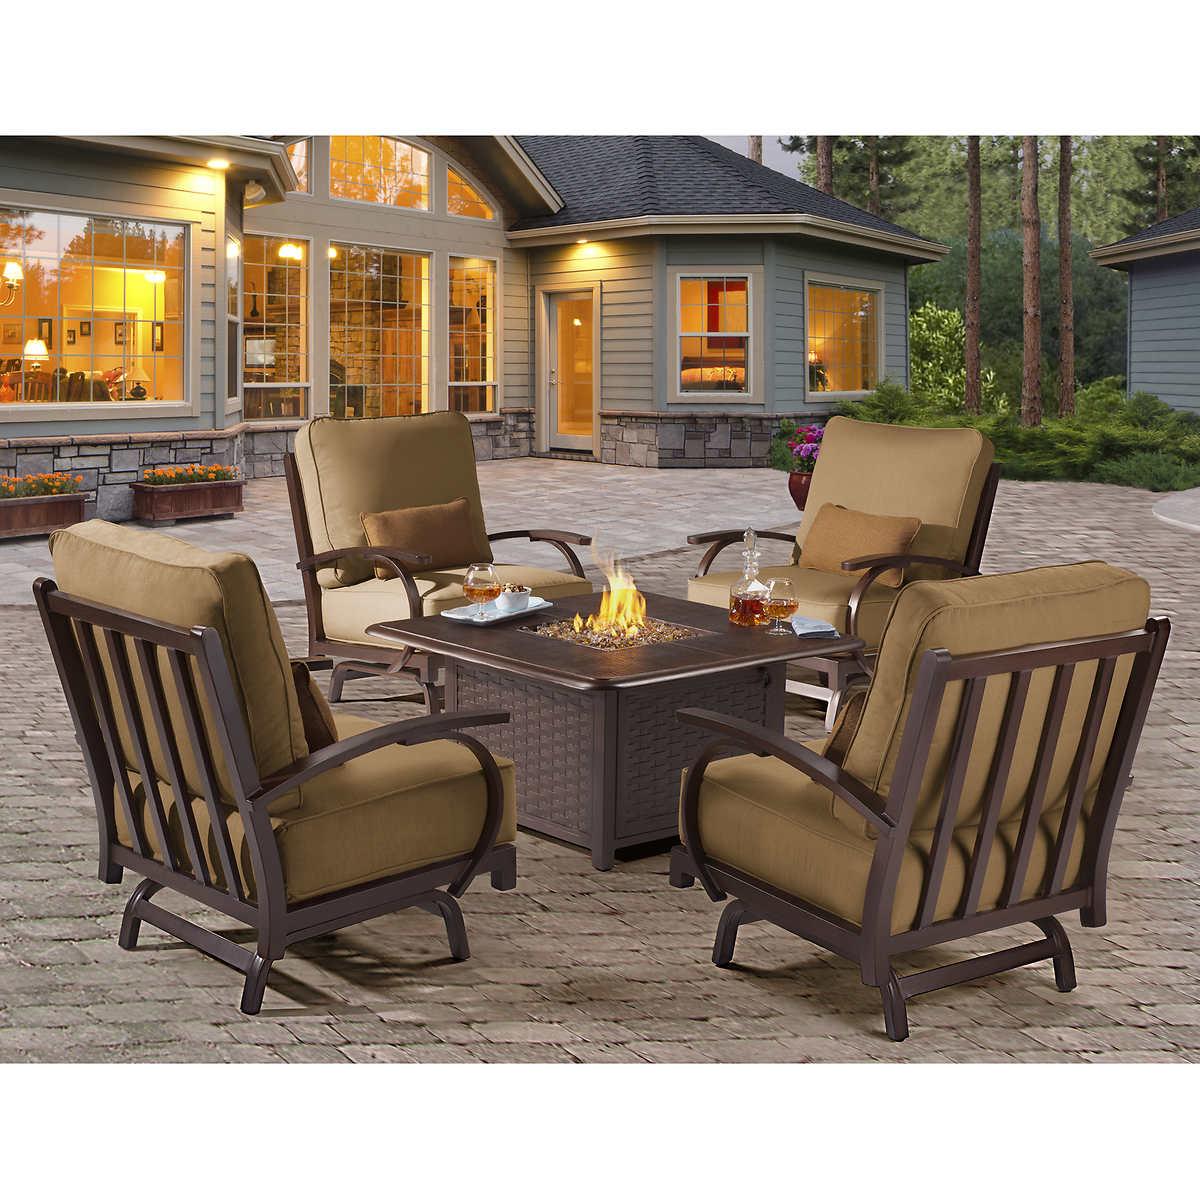 SummerWinds Patio Furniture Costco